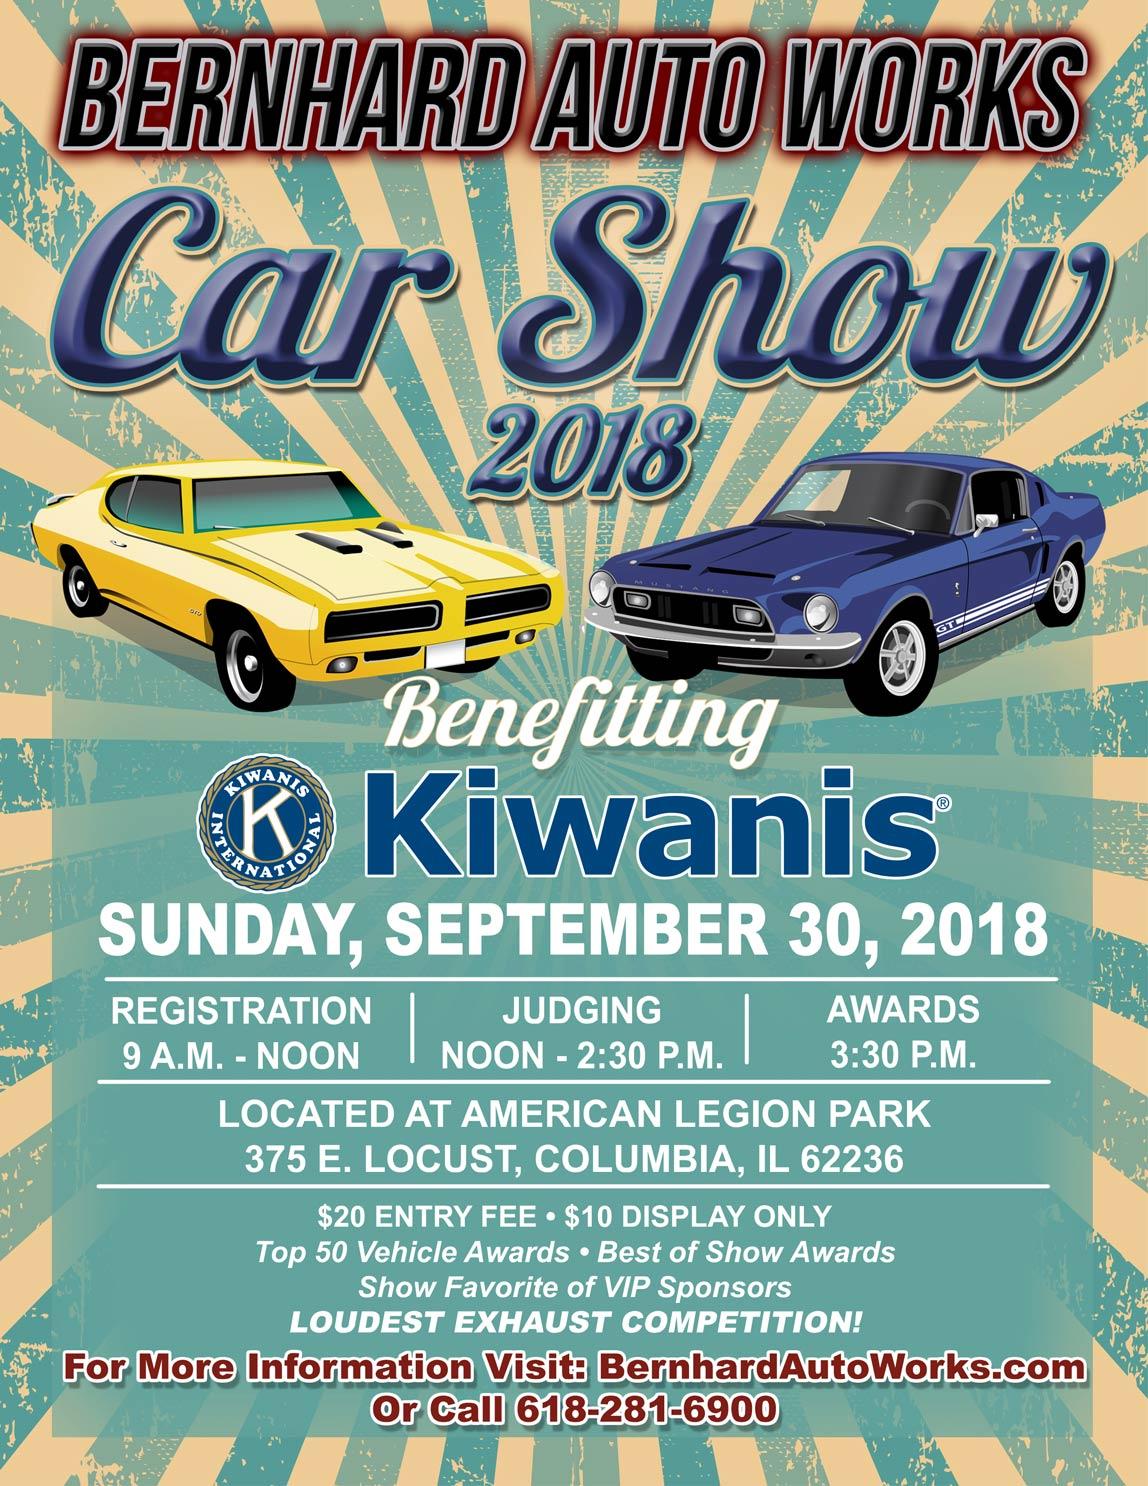 Bernhard AutoWorks About Us Car Show - September car shows